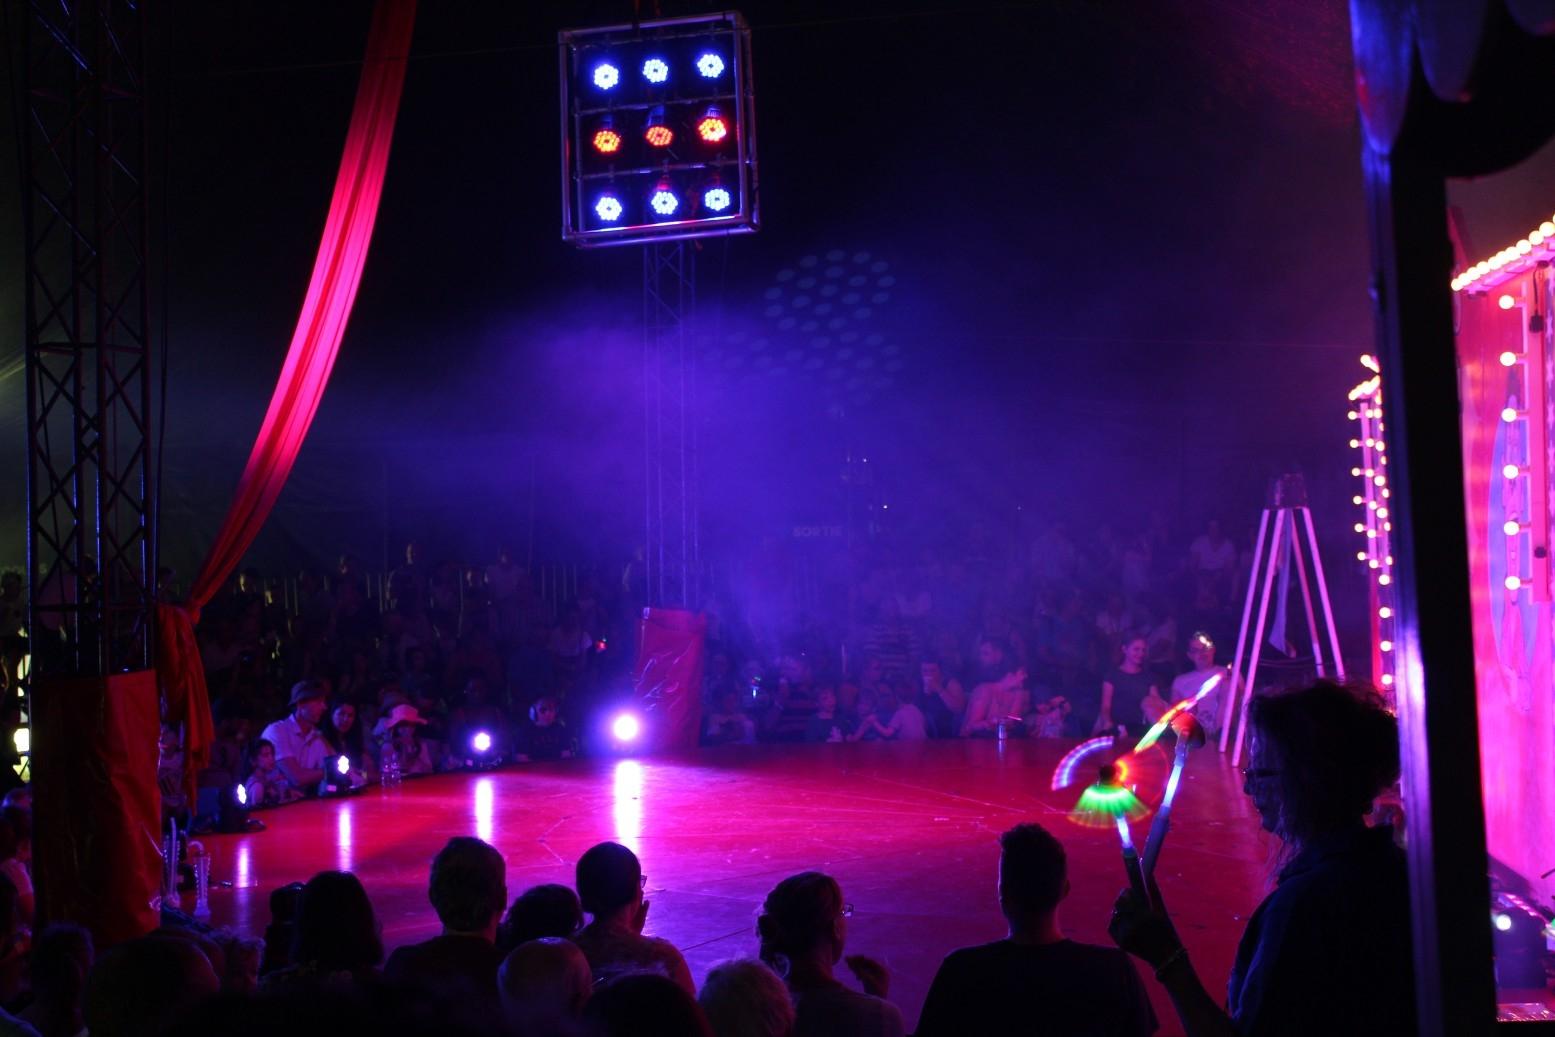 Geronimo Family Festival Arley Hall (13)